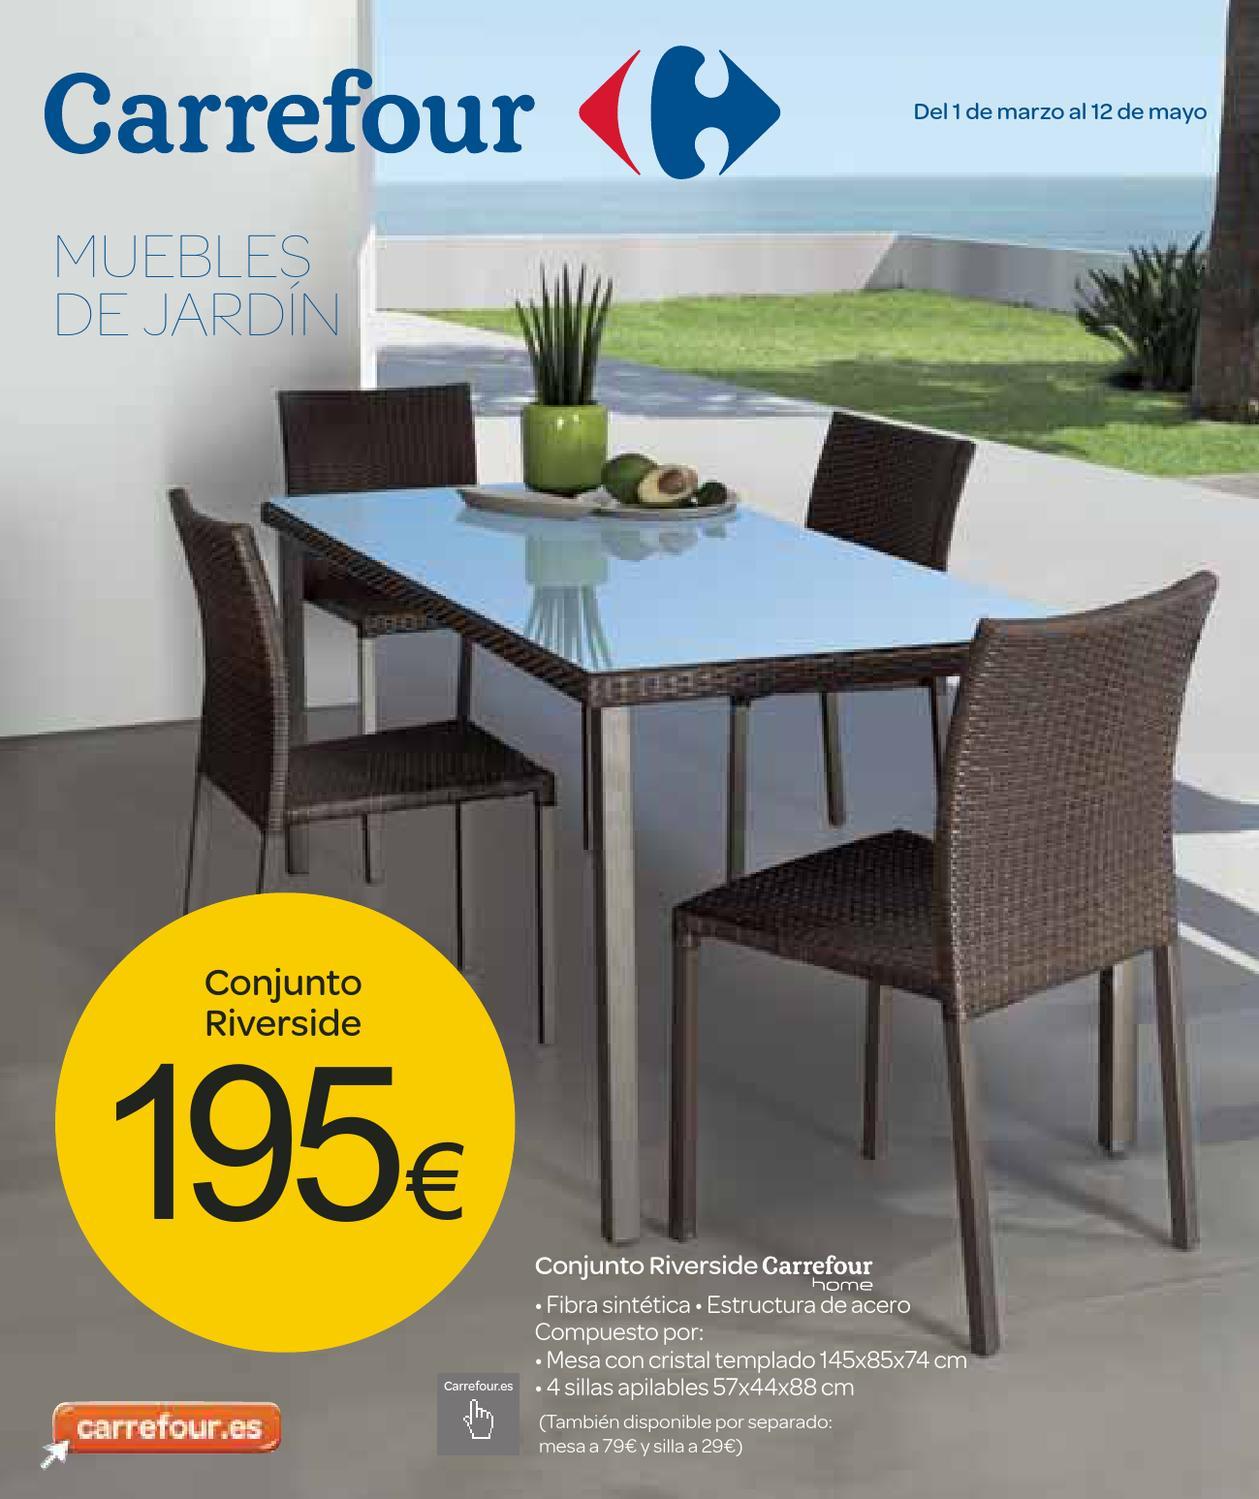 Carrefour catalogo muebles jardín by Hackos ECC - issuu